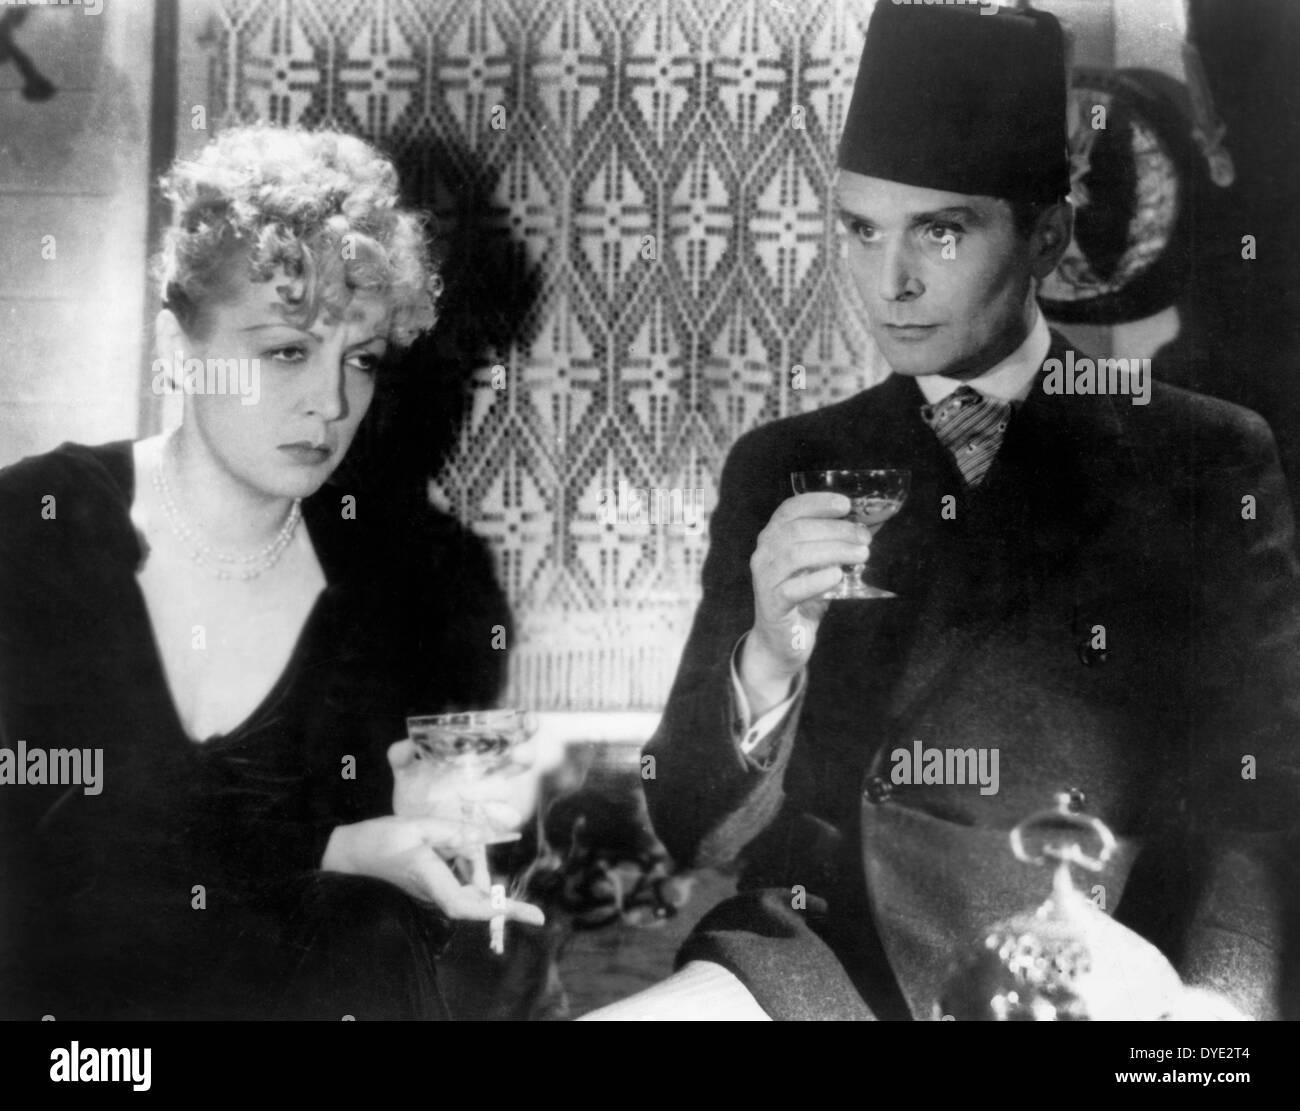 Dita Parlo, Pierre Blanchar, on-set of the Film, 'Mademoiselle Docteur', 1937 - Stock Image